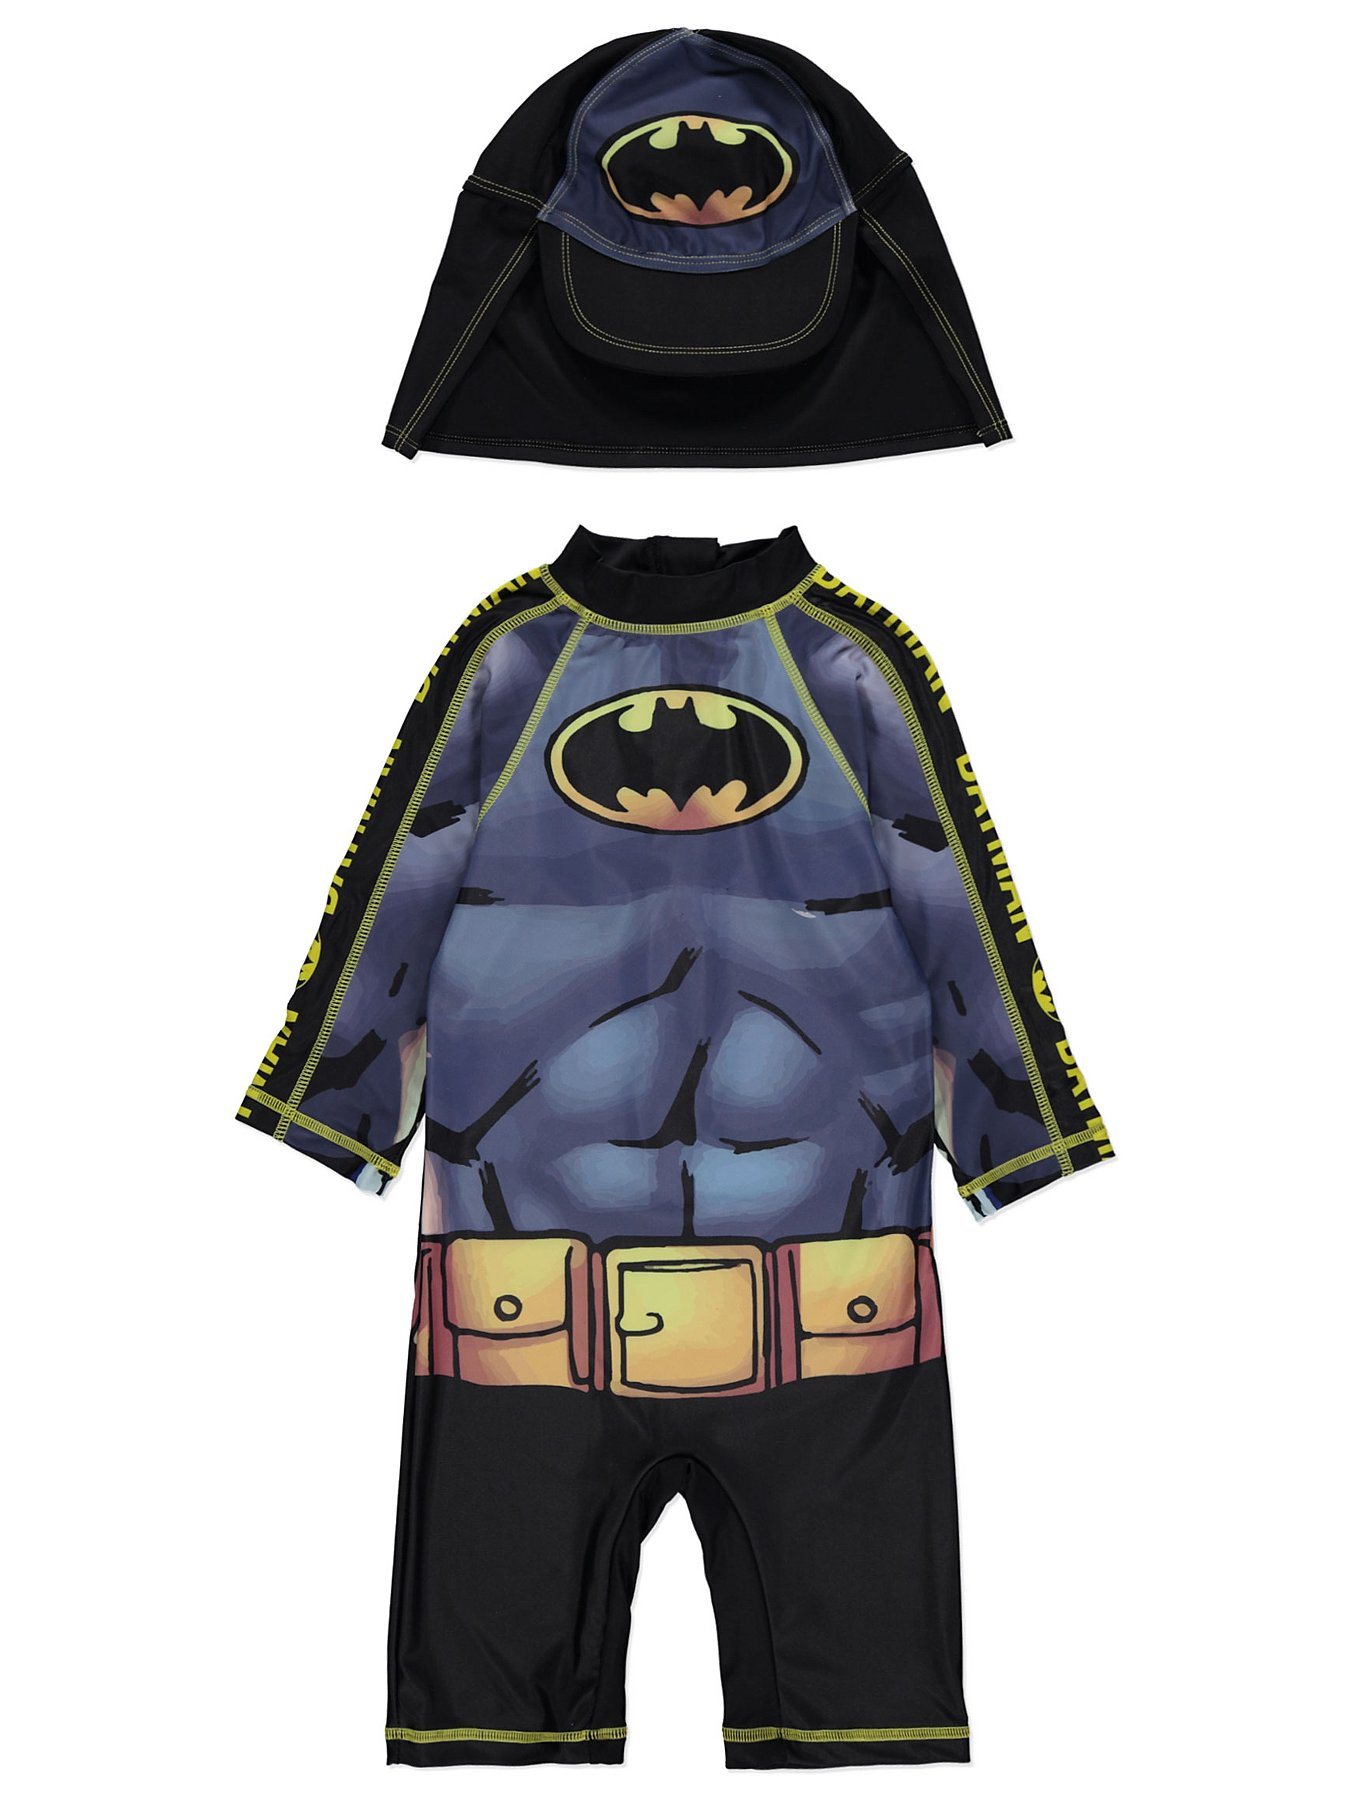 8127eddeea DC Comics Batman Sun Protection UV40 Swimsuit and Hat Set. Reset